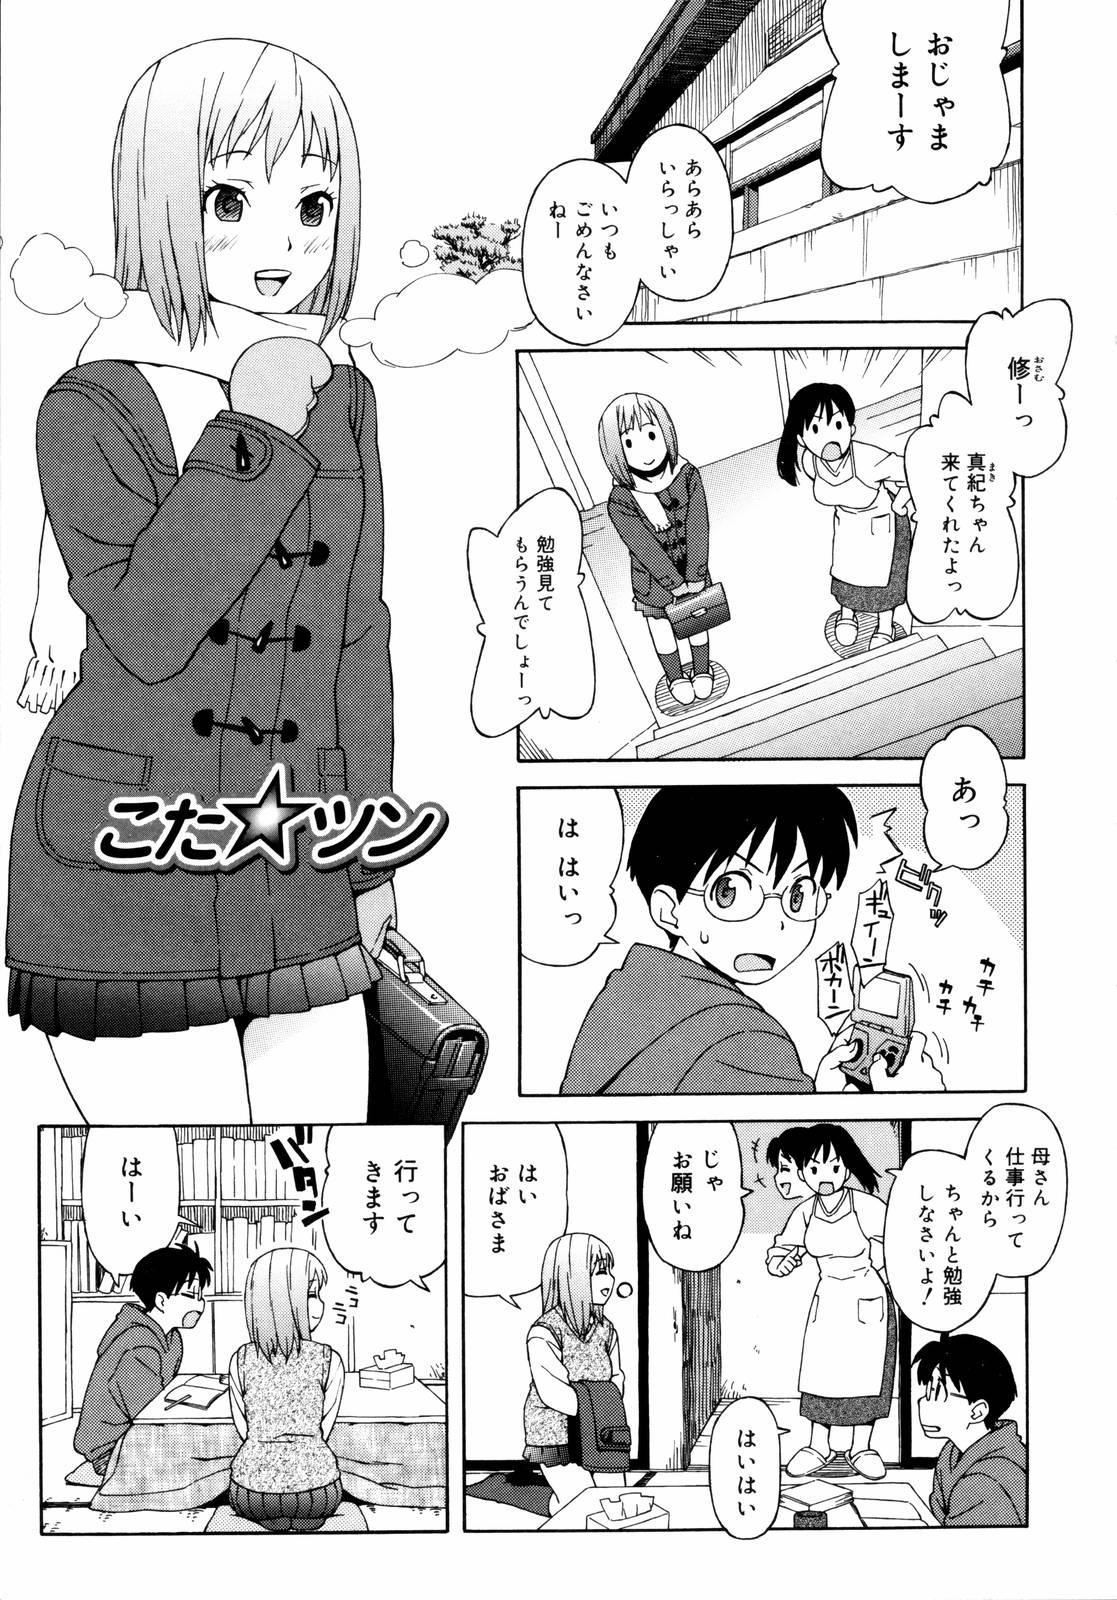 Shishunki wa Hatsujouki - Adolescence is a sexual excitement period. 150